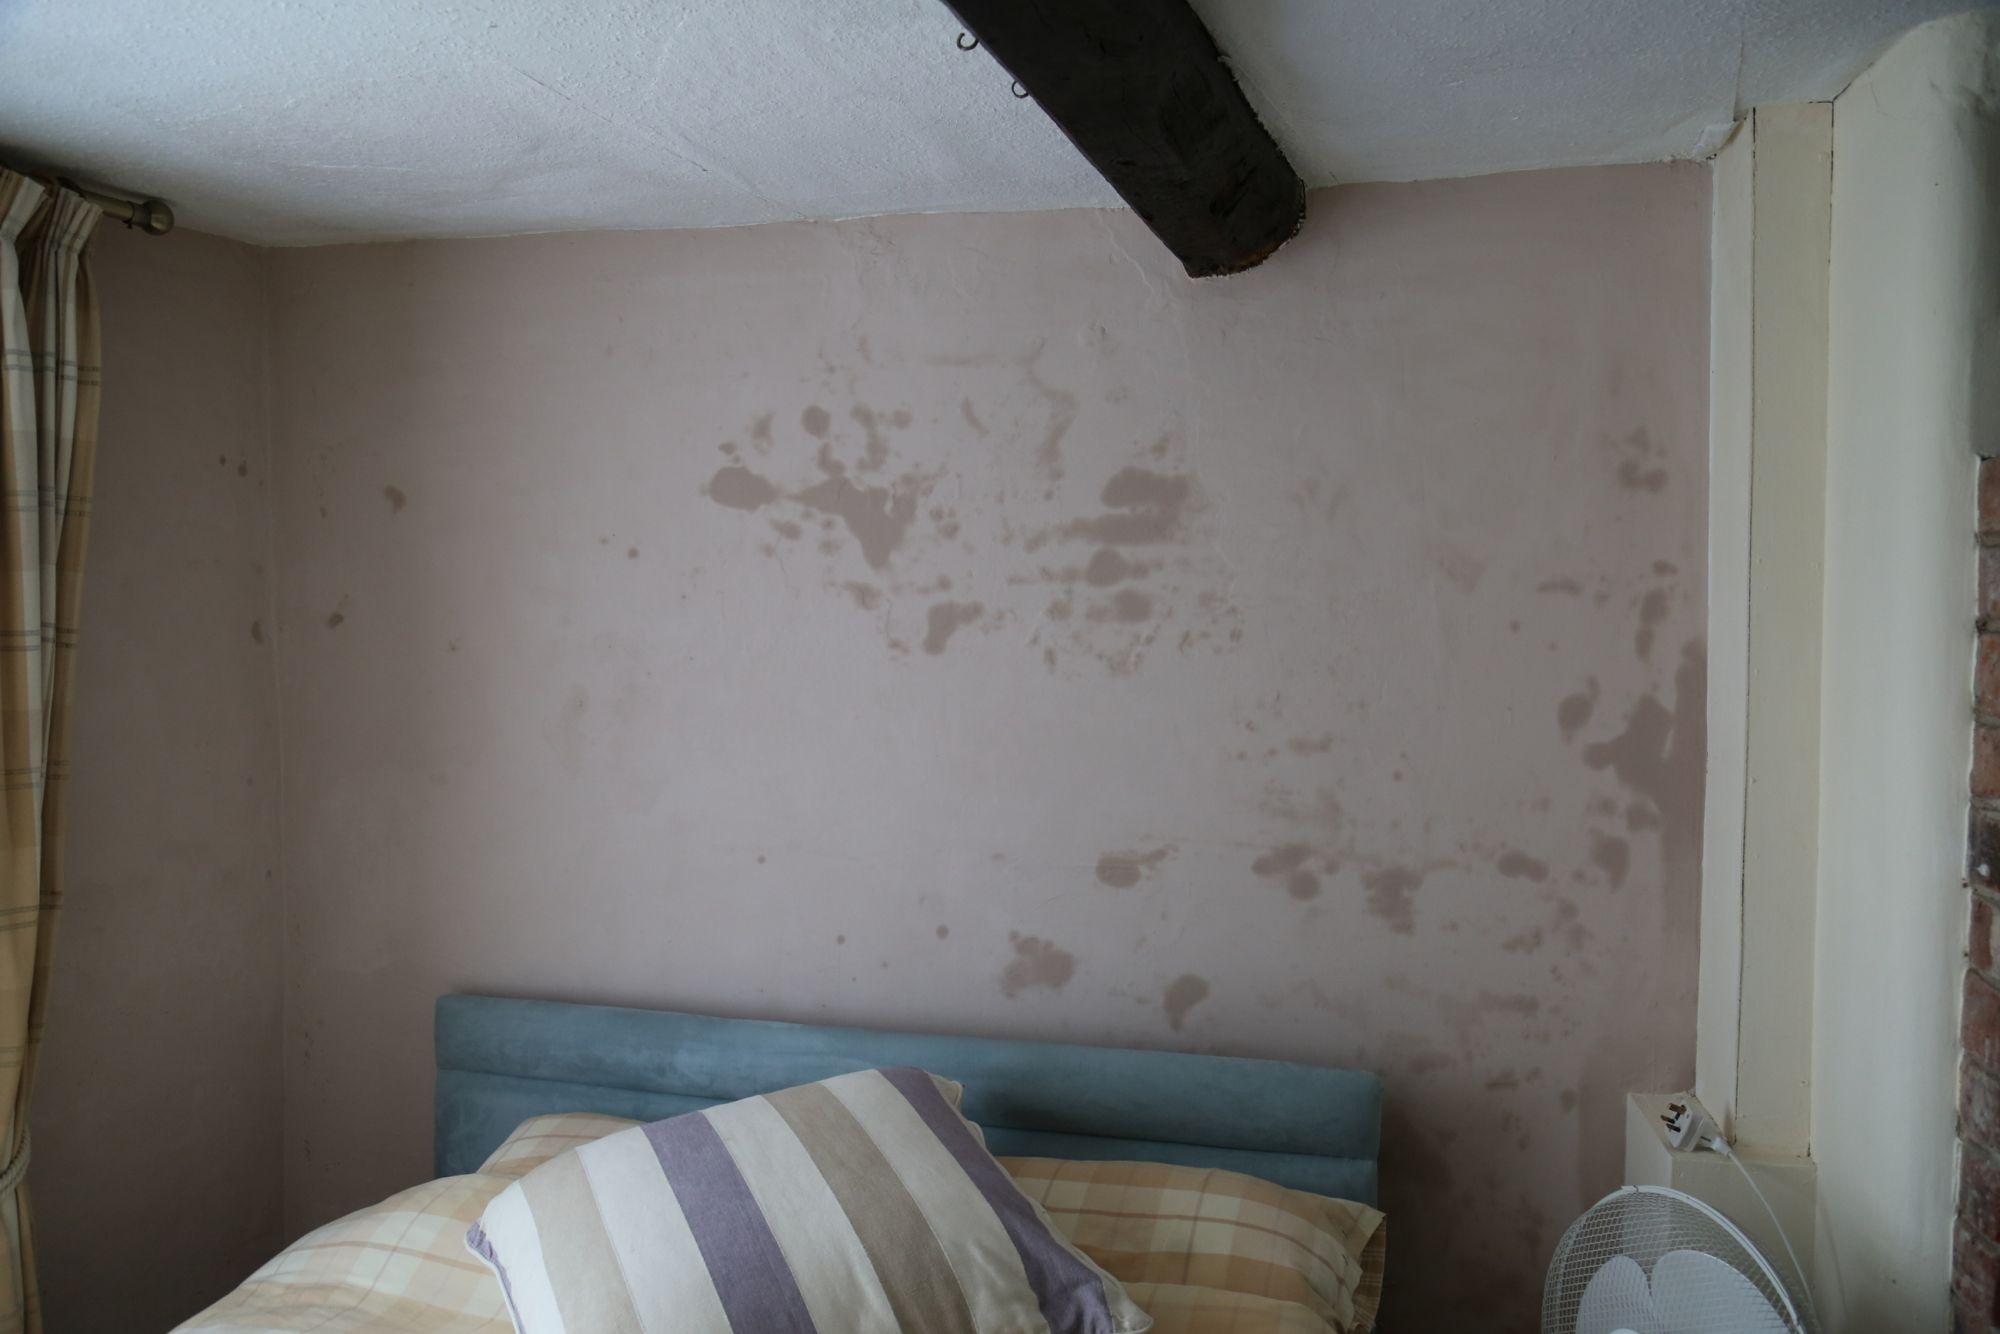 Salt damage in masonry walls